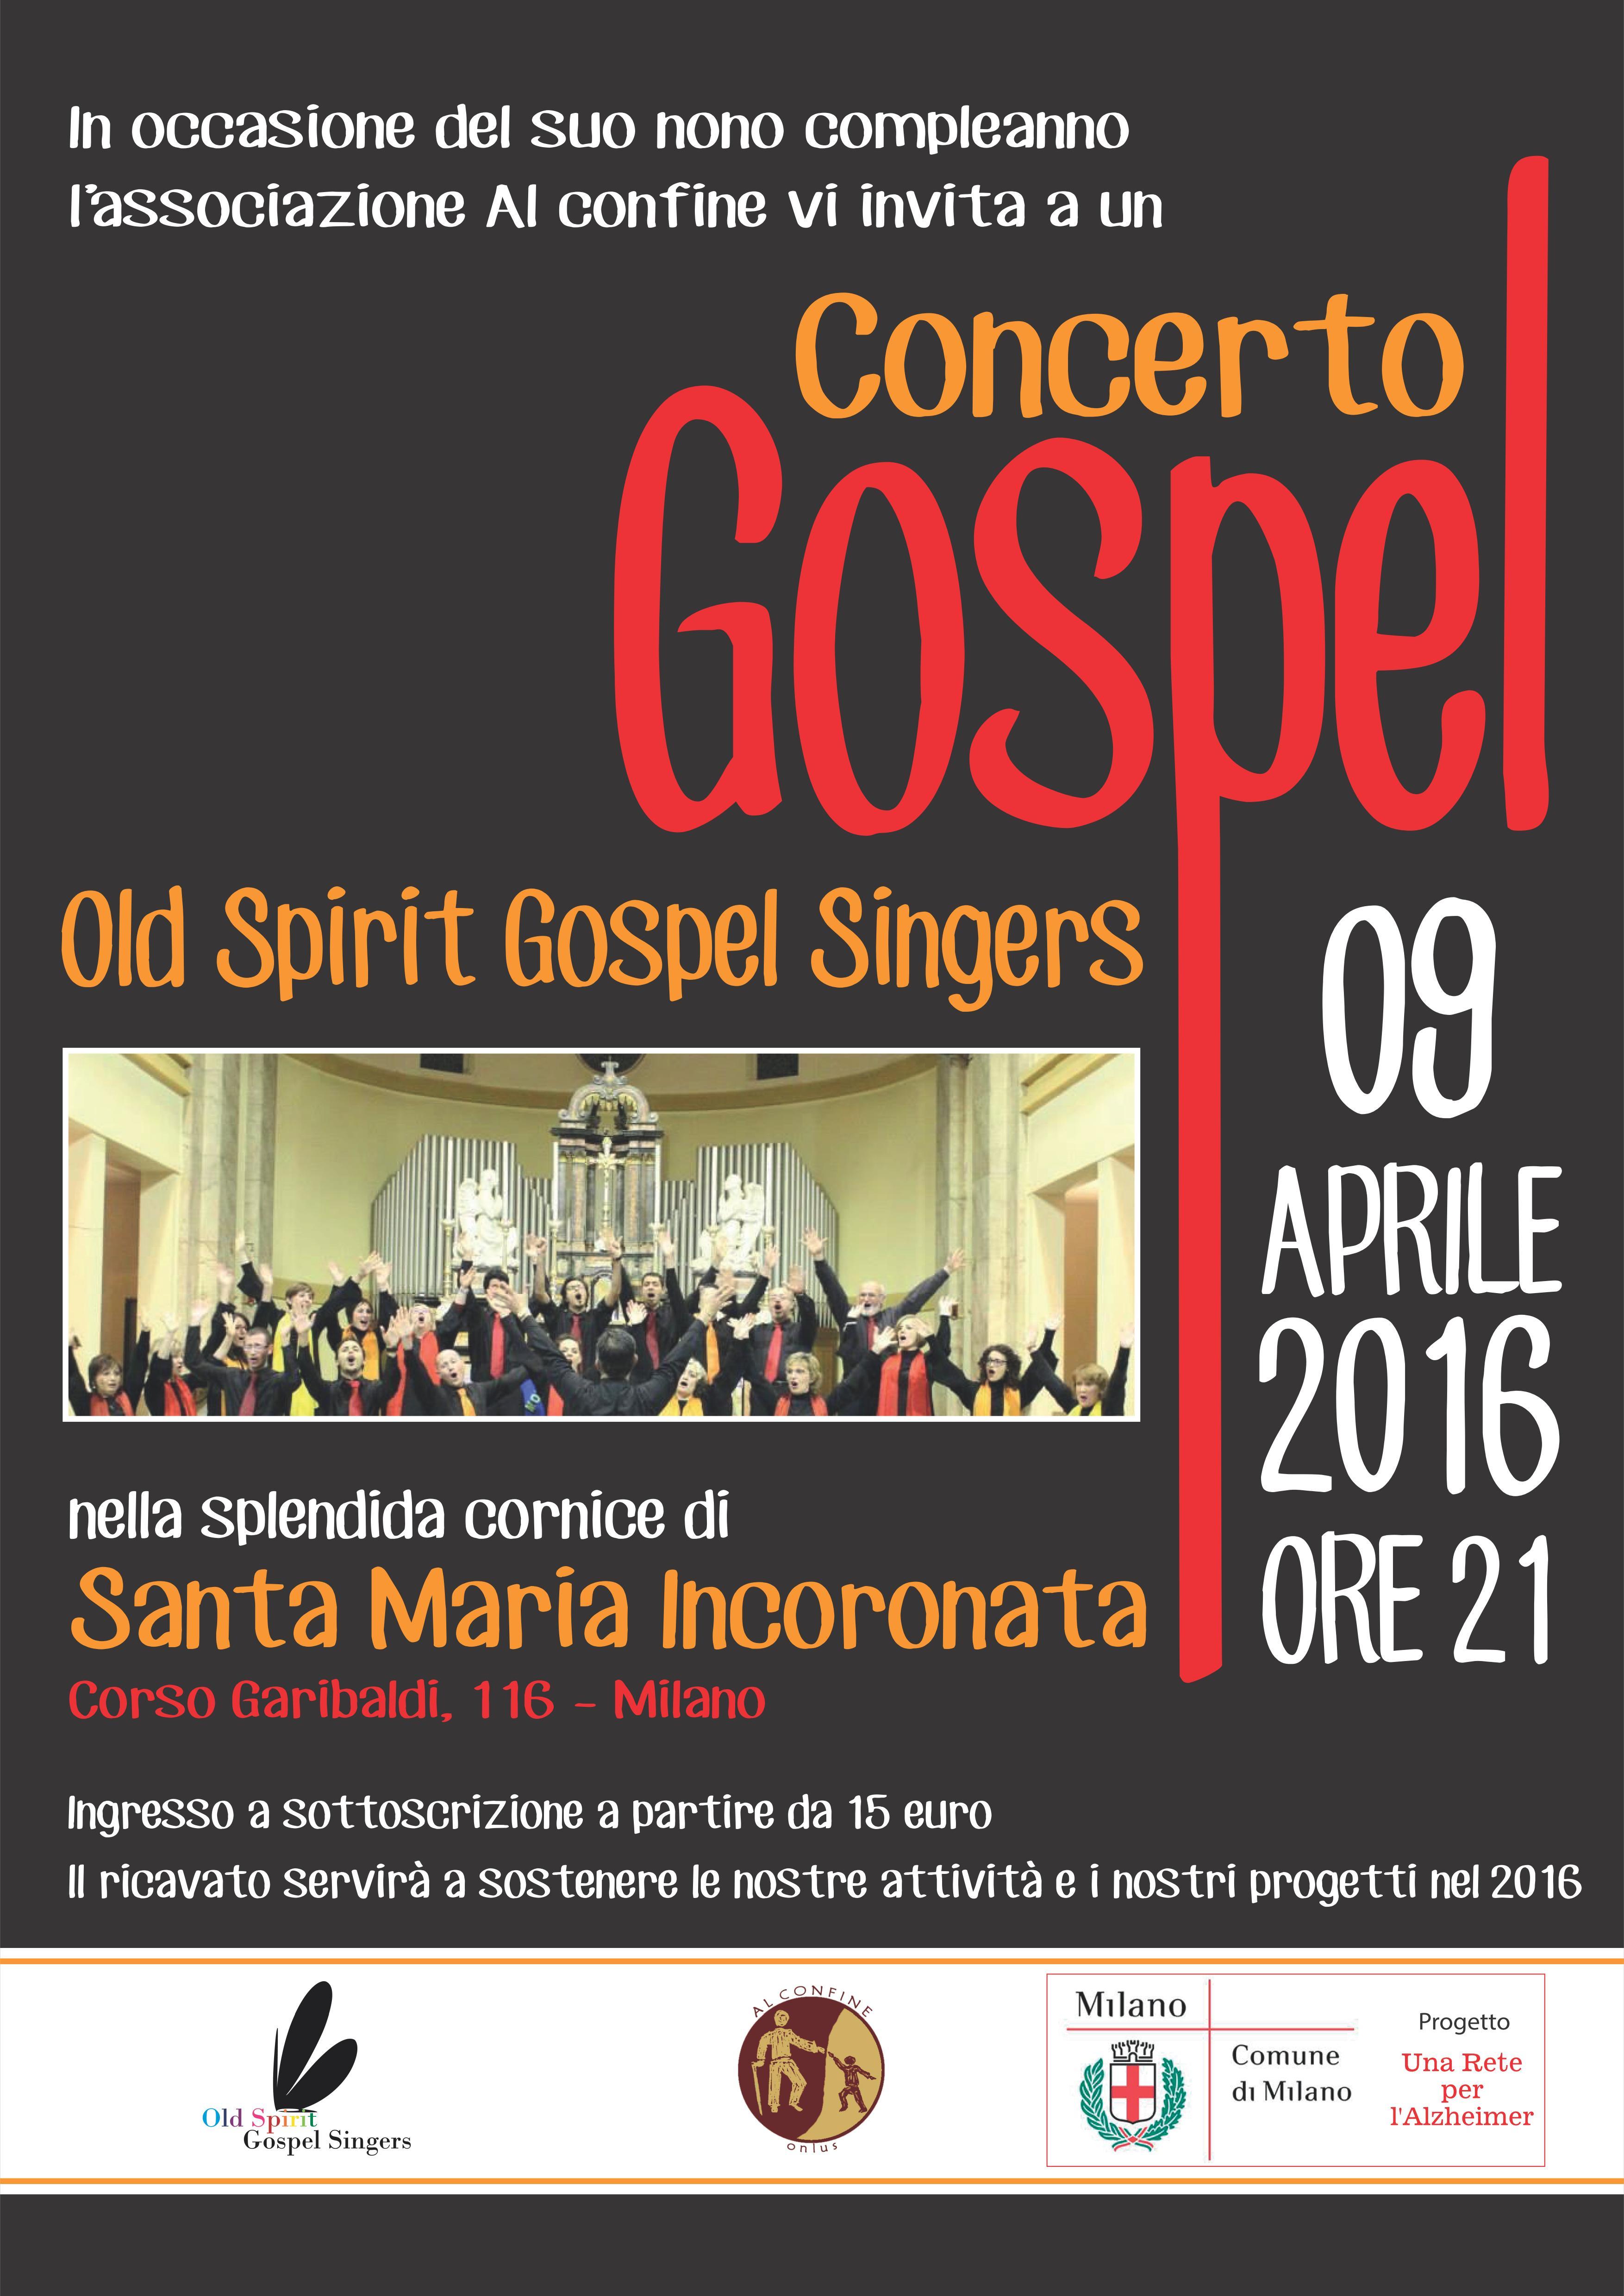 Old Spirit Gospel Singers in Concerto per Al confine Onlus